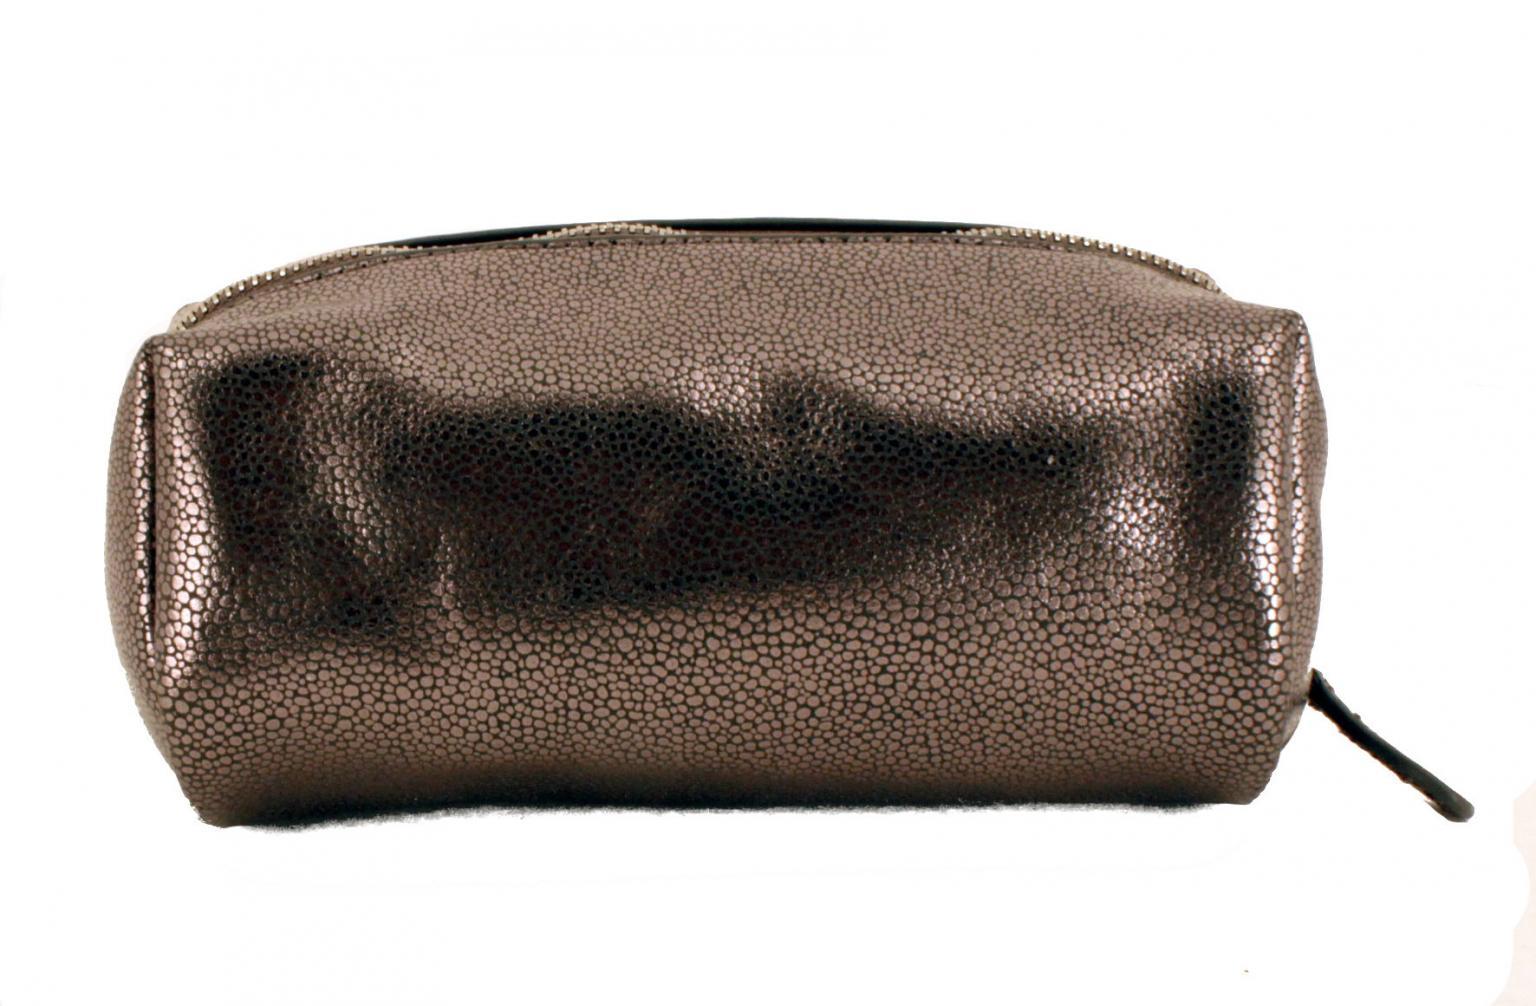 L. Credi Anke Aufbewahrungsetui silber Metallic zip